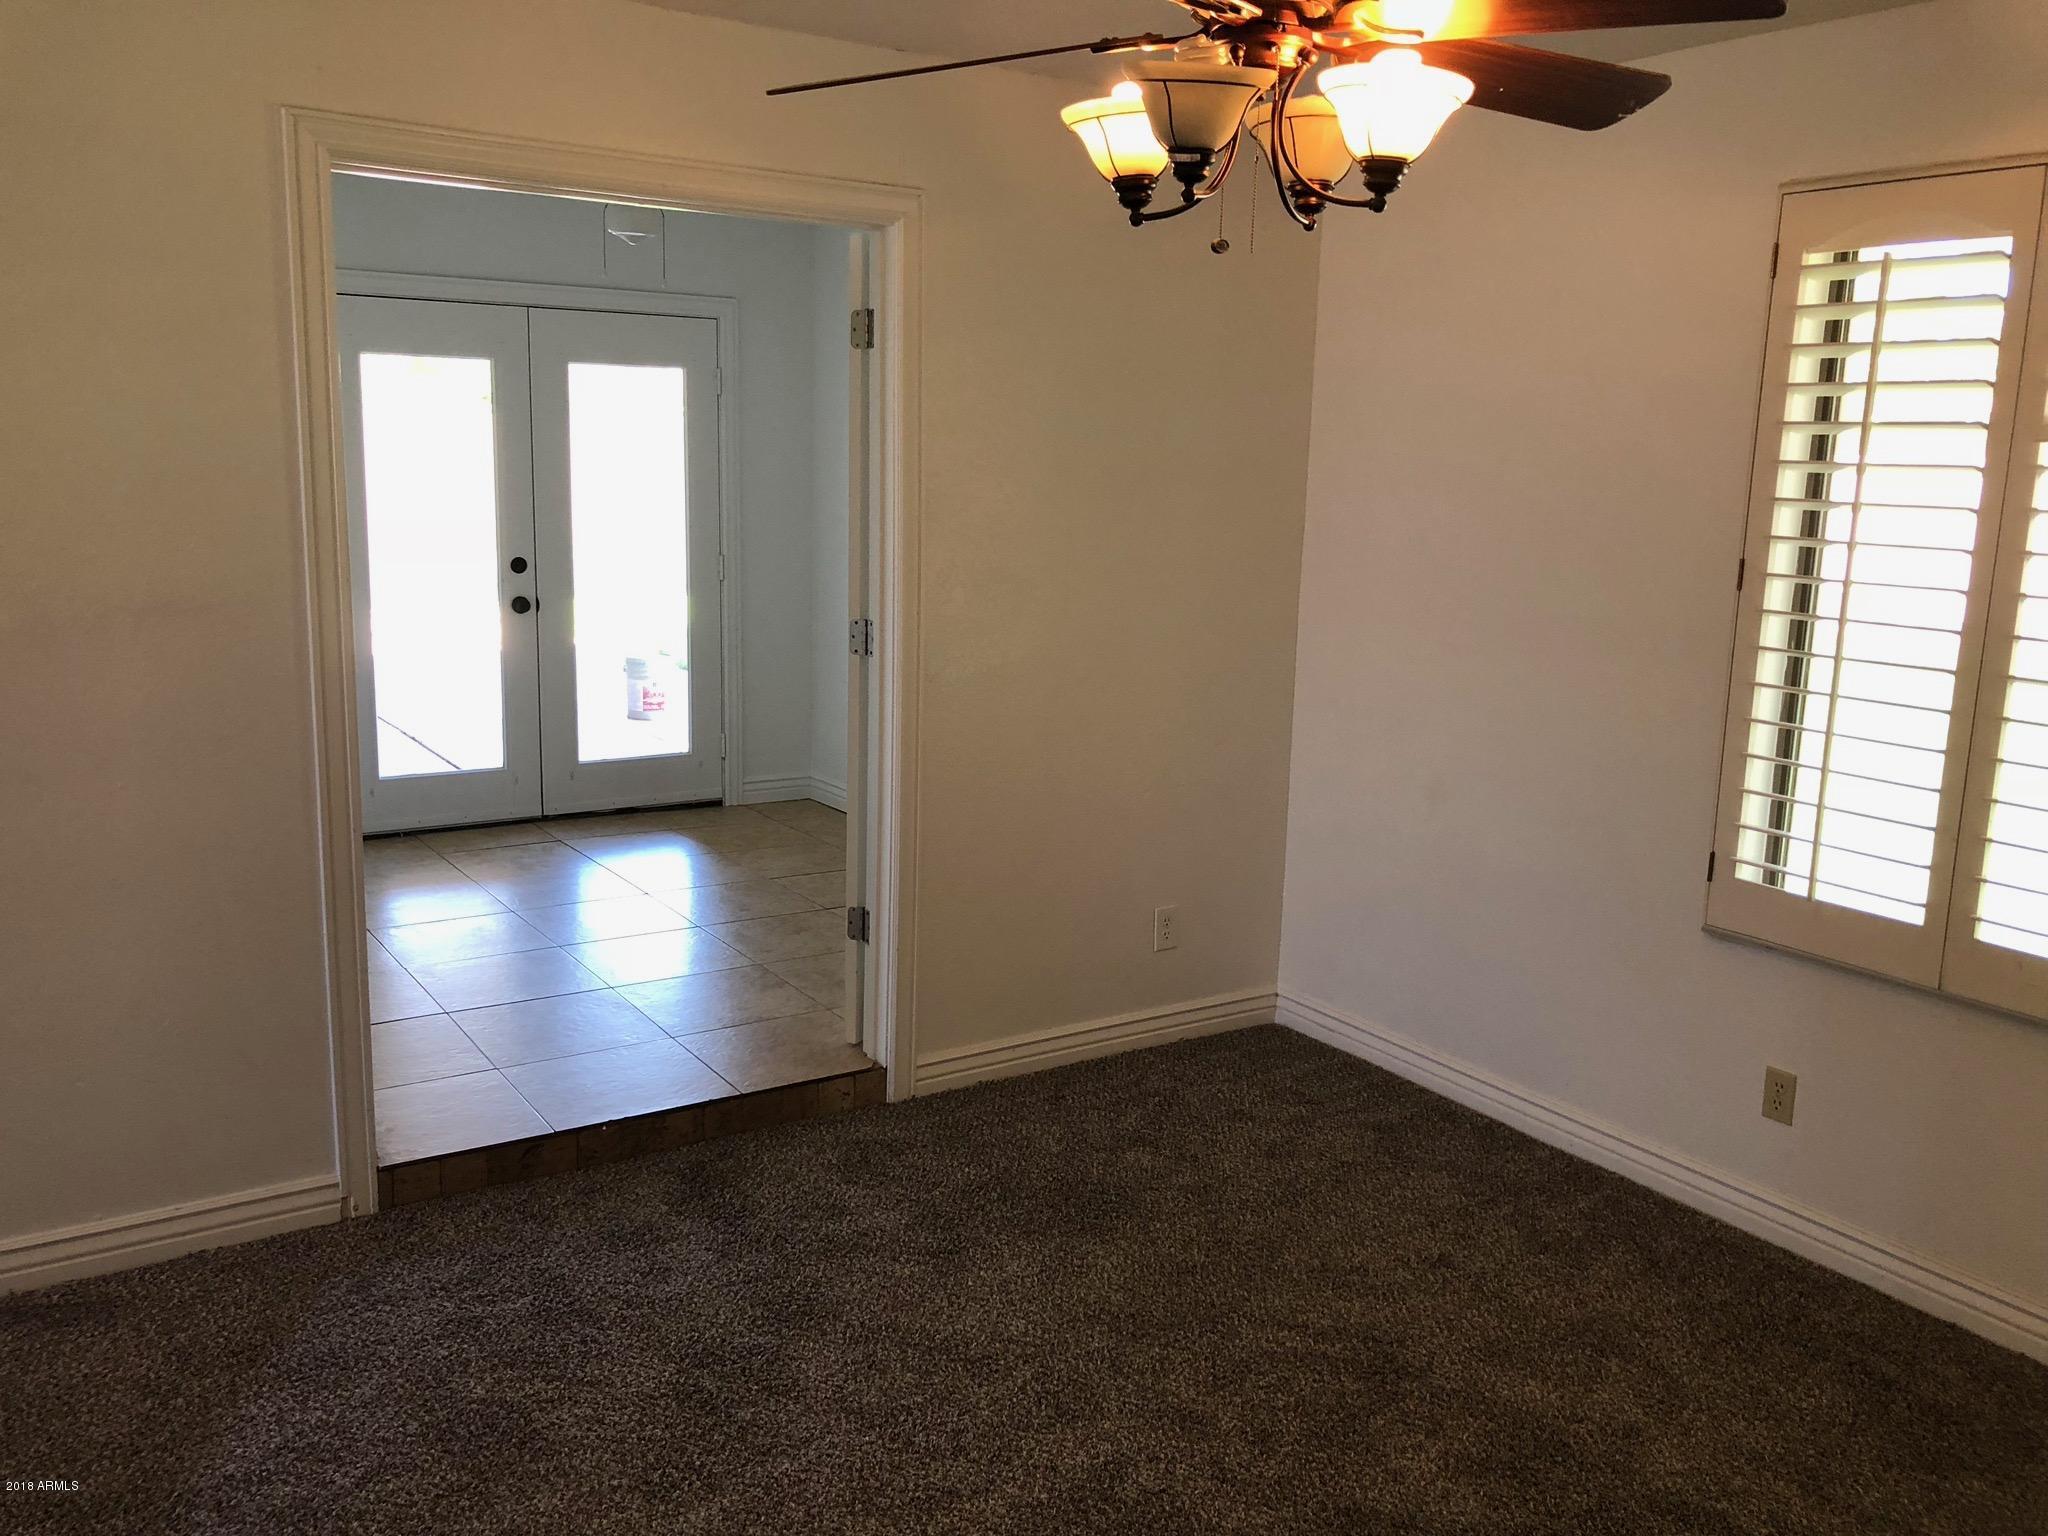 MLS 5806231 450 E Meadows Lane, Gilbert, AZ 85234 Gilbert AZ Circle G Ranches